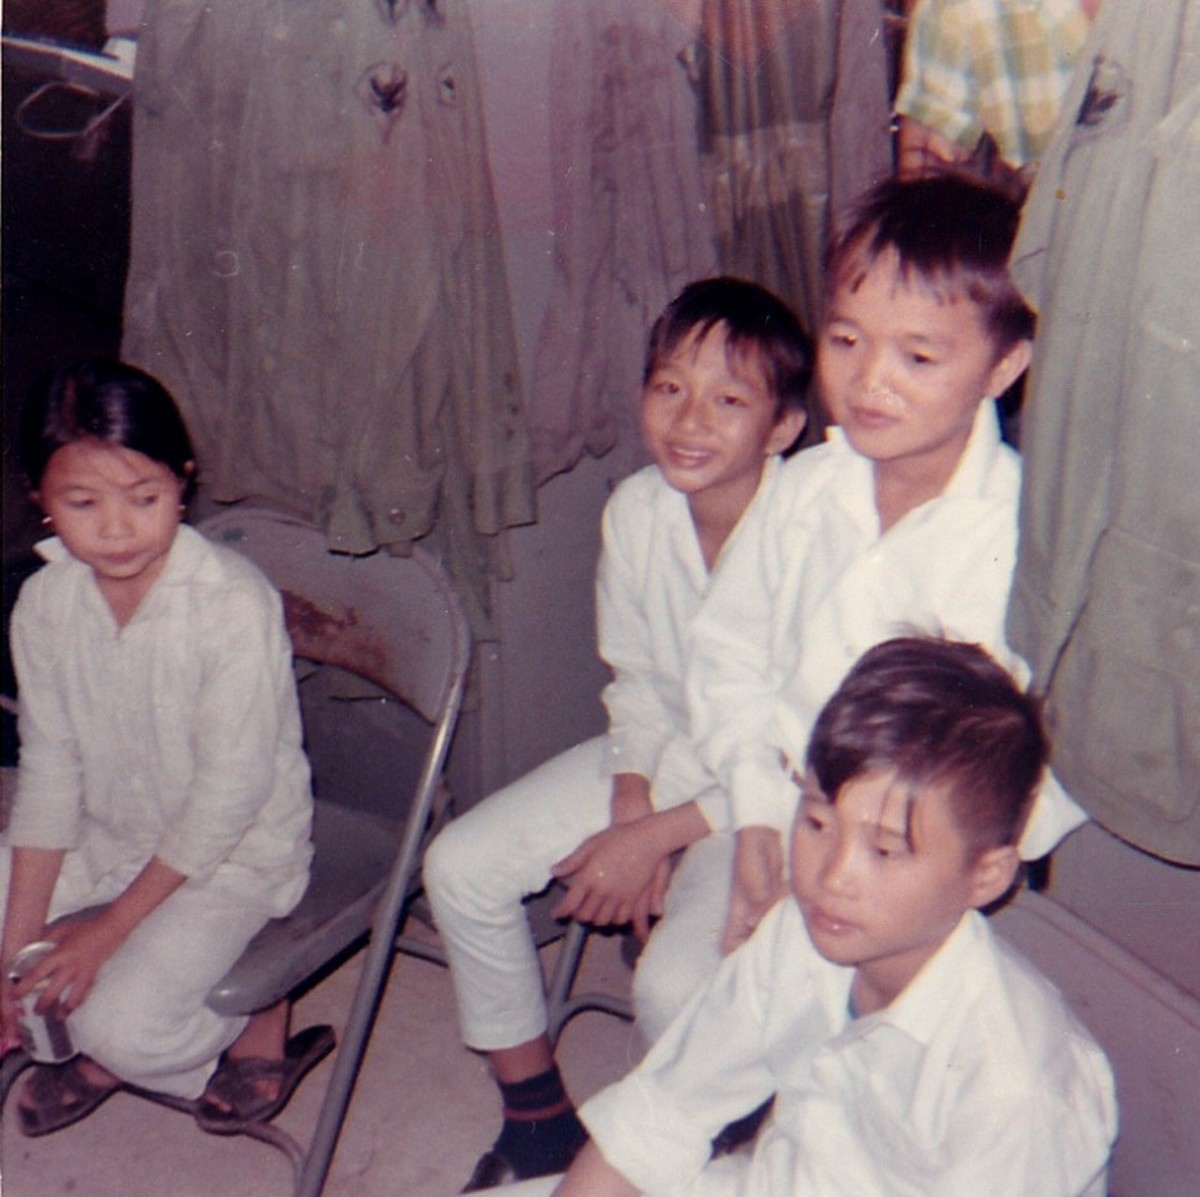 Orphans in Vietnam taken on Thanksgiving Day, 1968